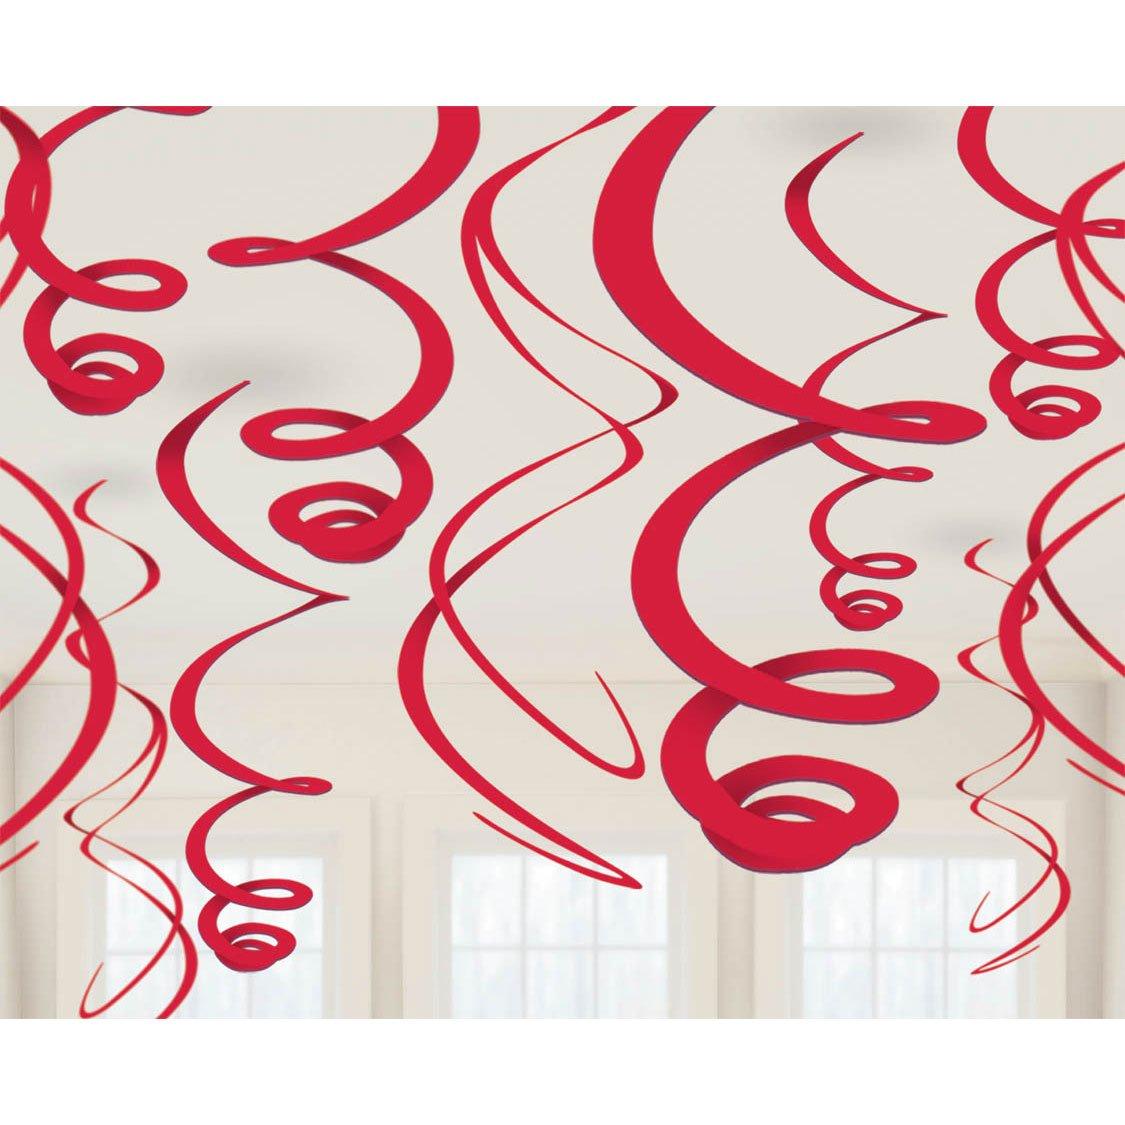 Amscan 67055-40-55 55 cm Plastic Swirls Decorations Amscan International 67055.4